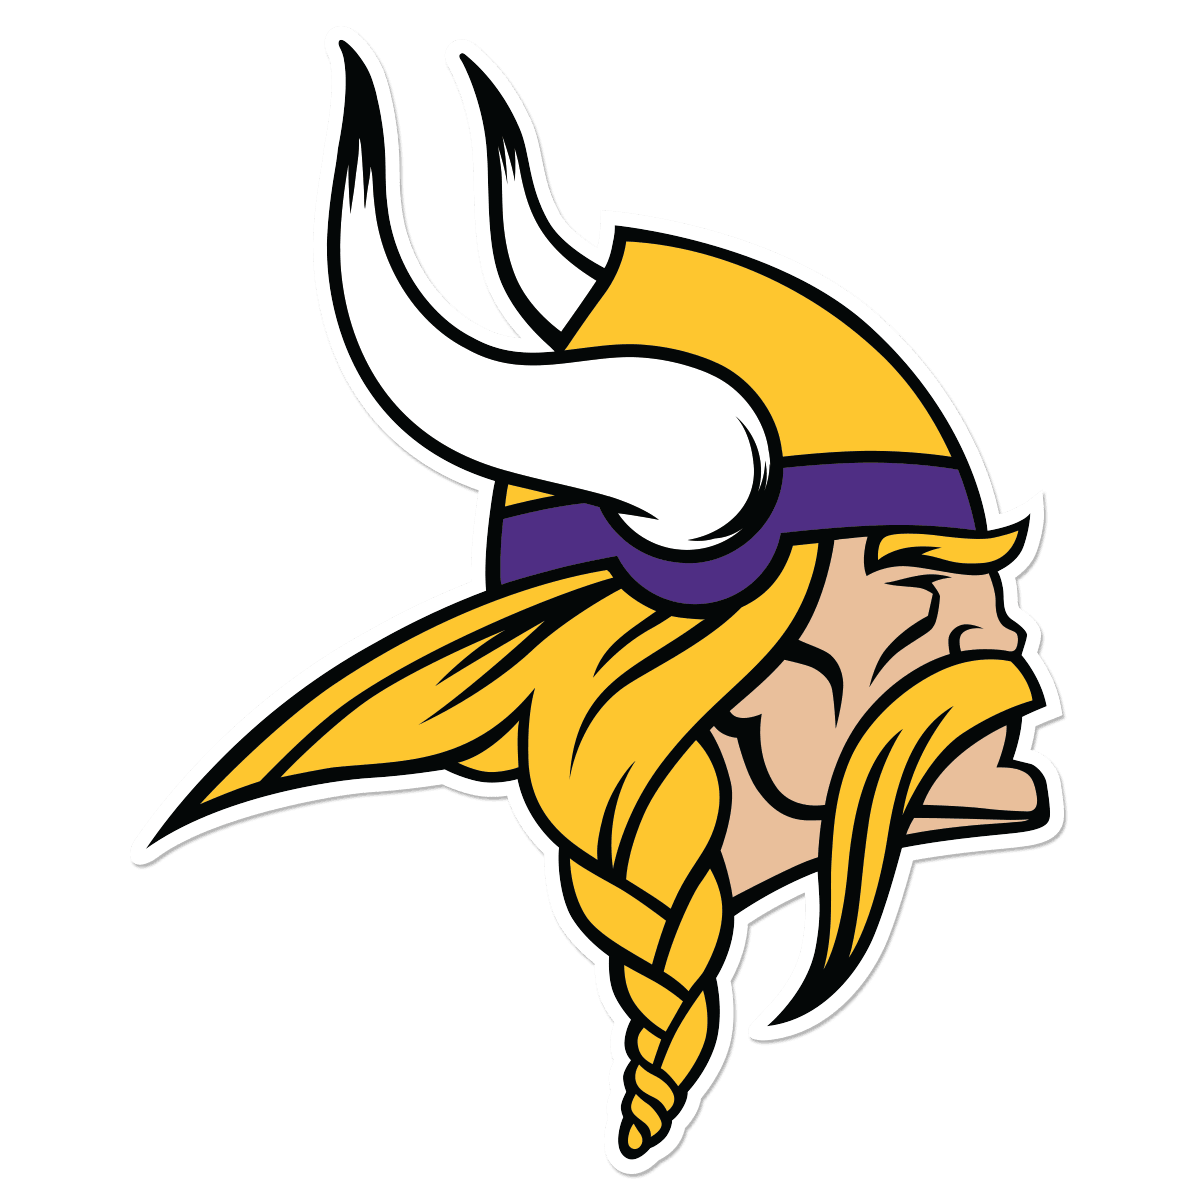 Minnesota Vikings Logo Free DXF File